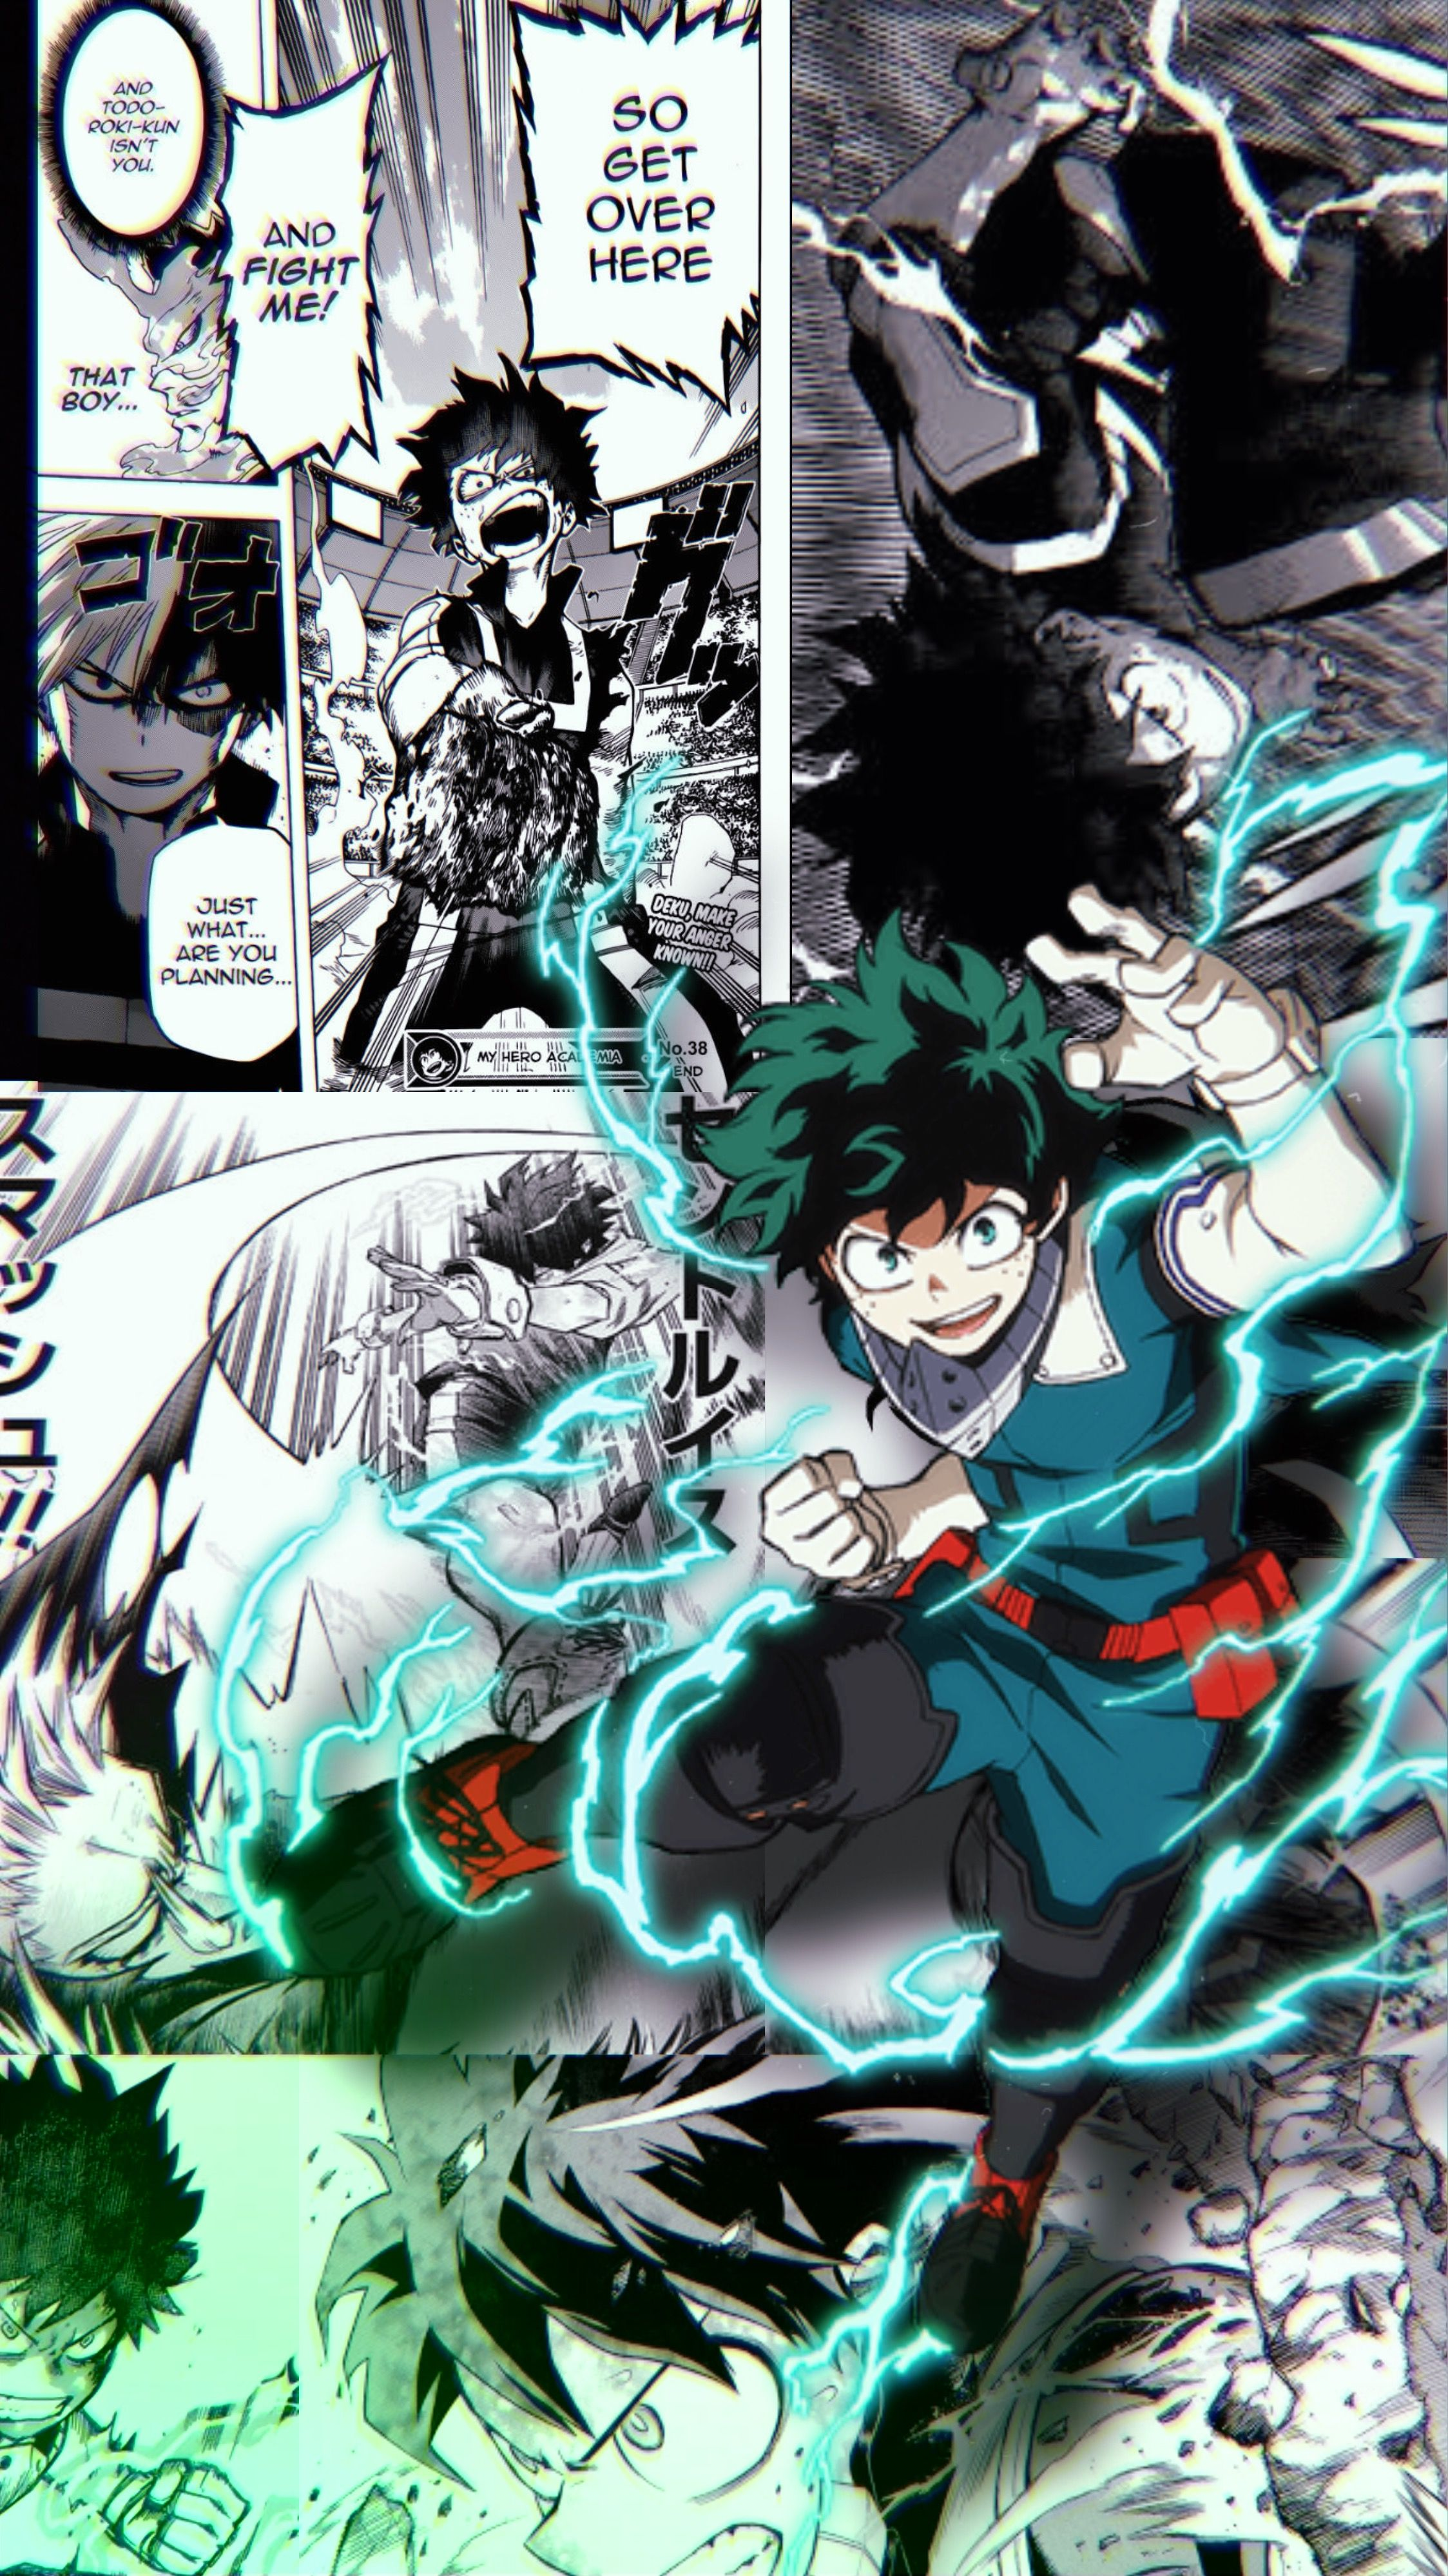 Deku Manga Panel Wallpaper In 2020 Anime Wallpaper Iphone Anime Wall Art Anime